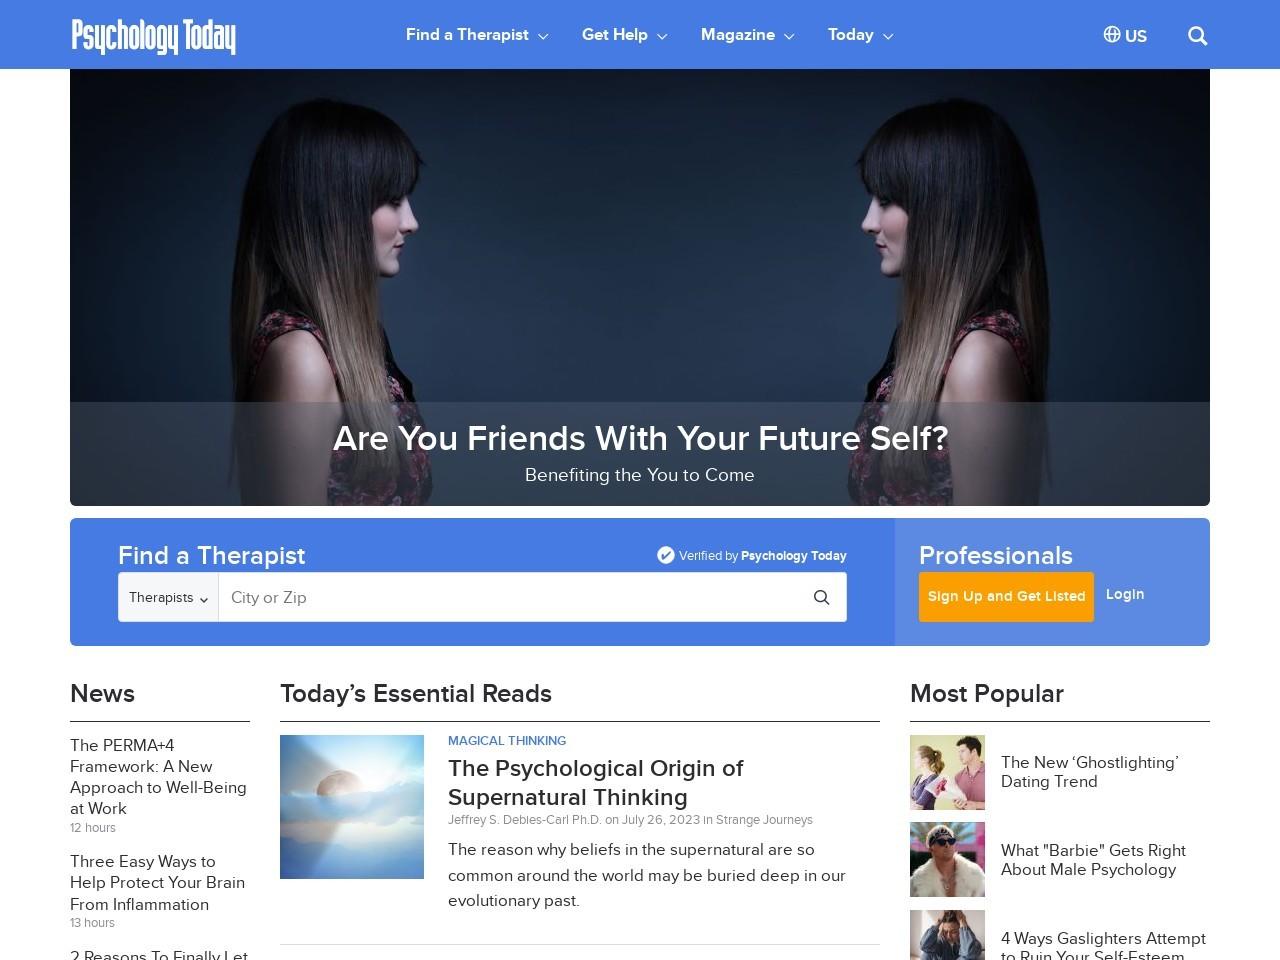 psychologytoday.com